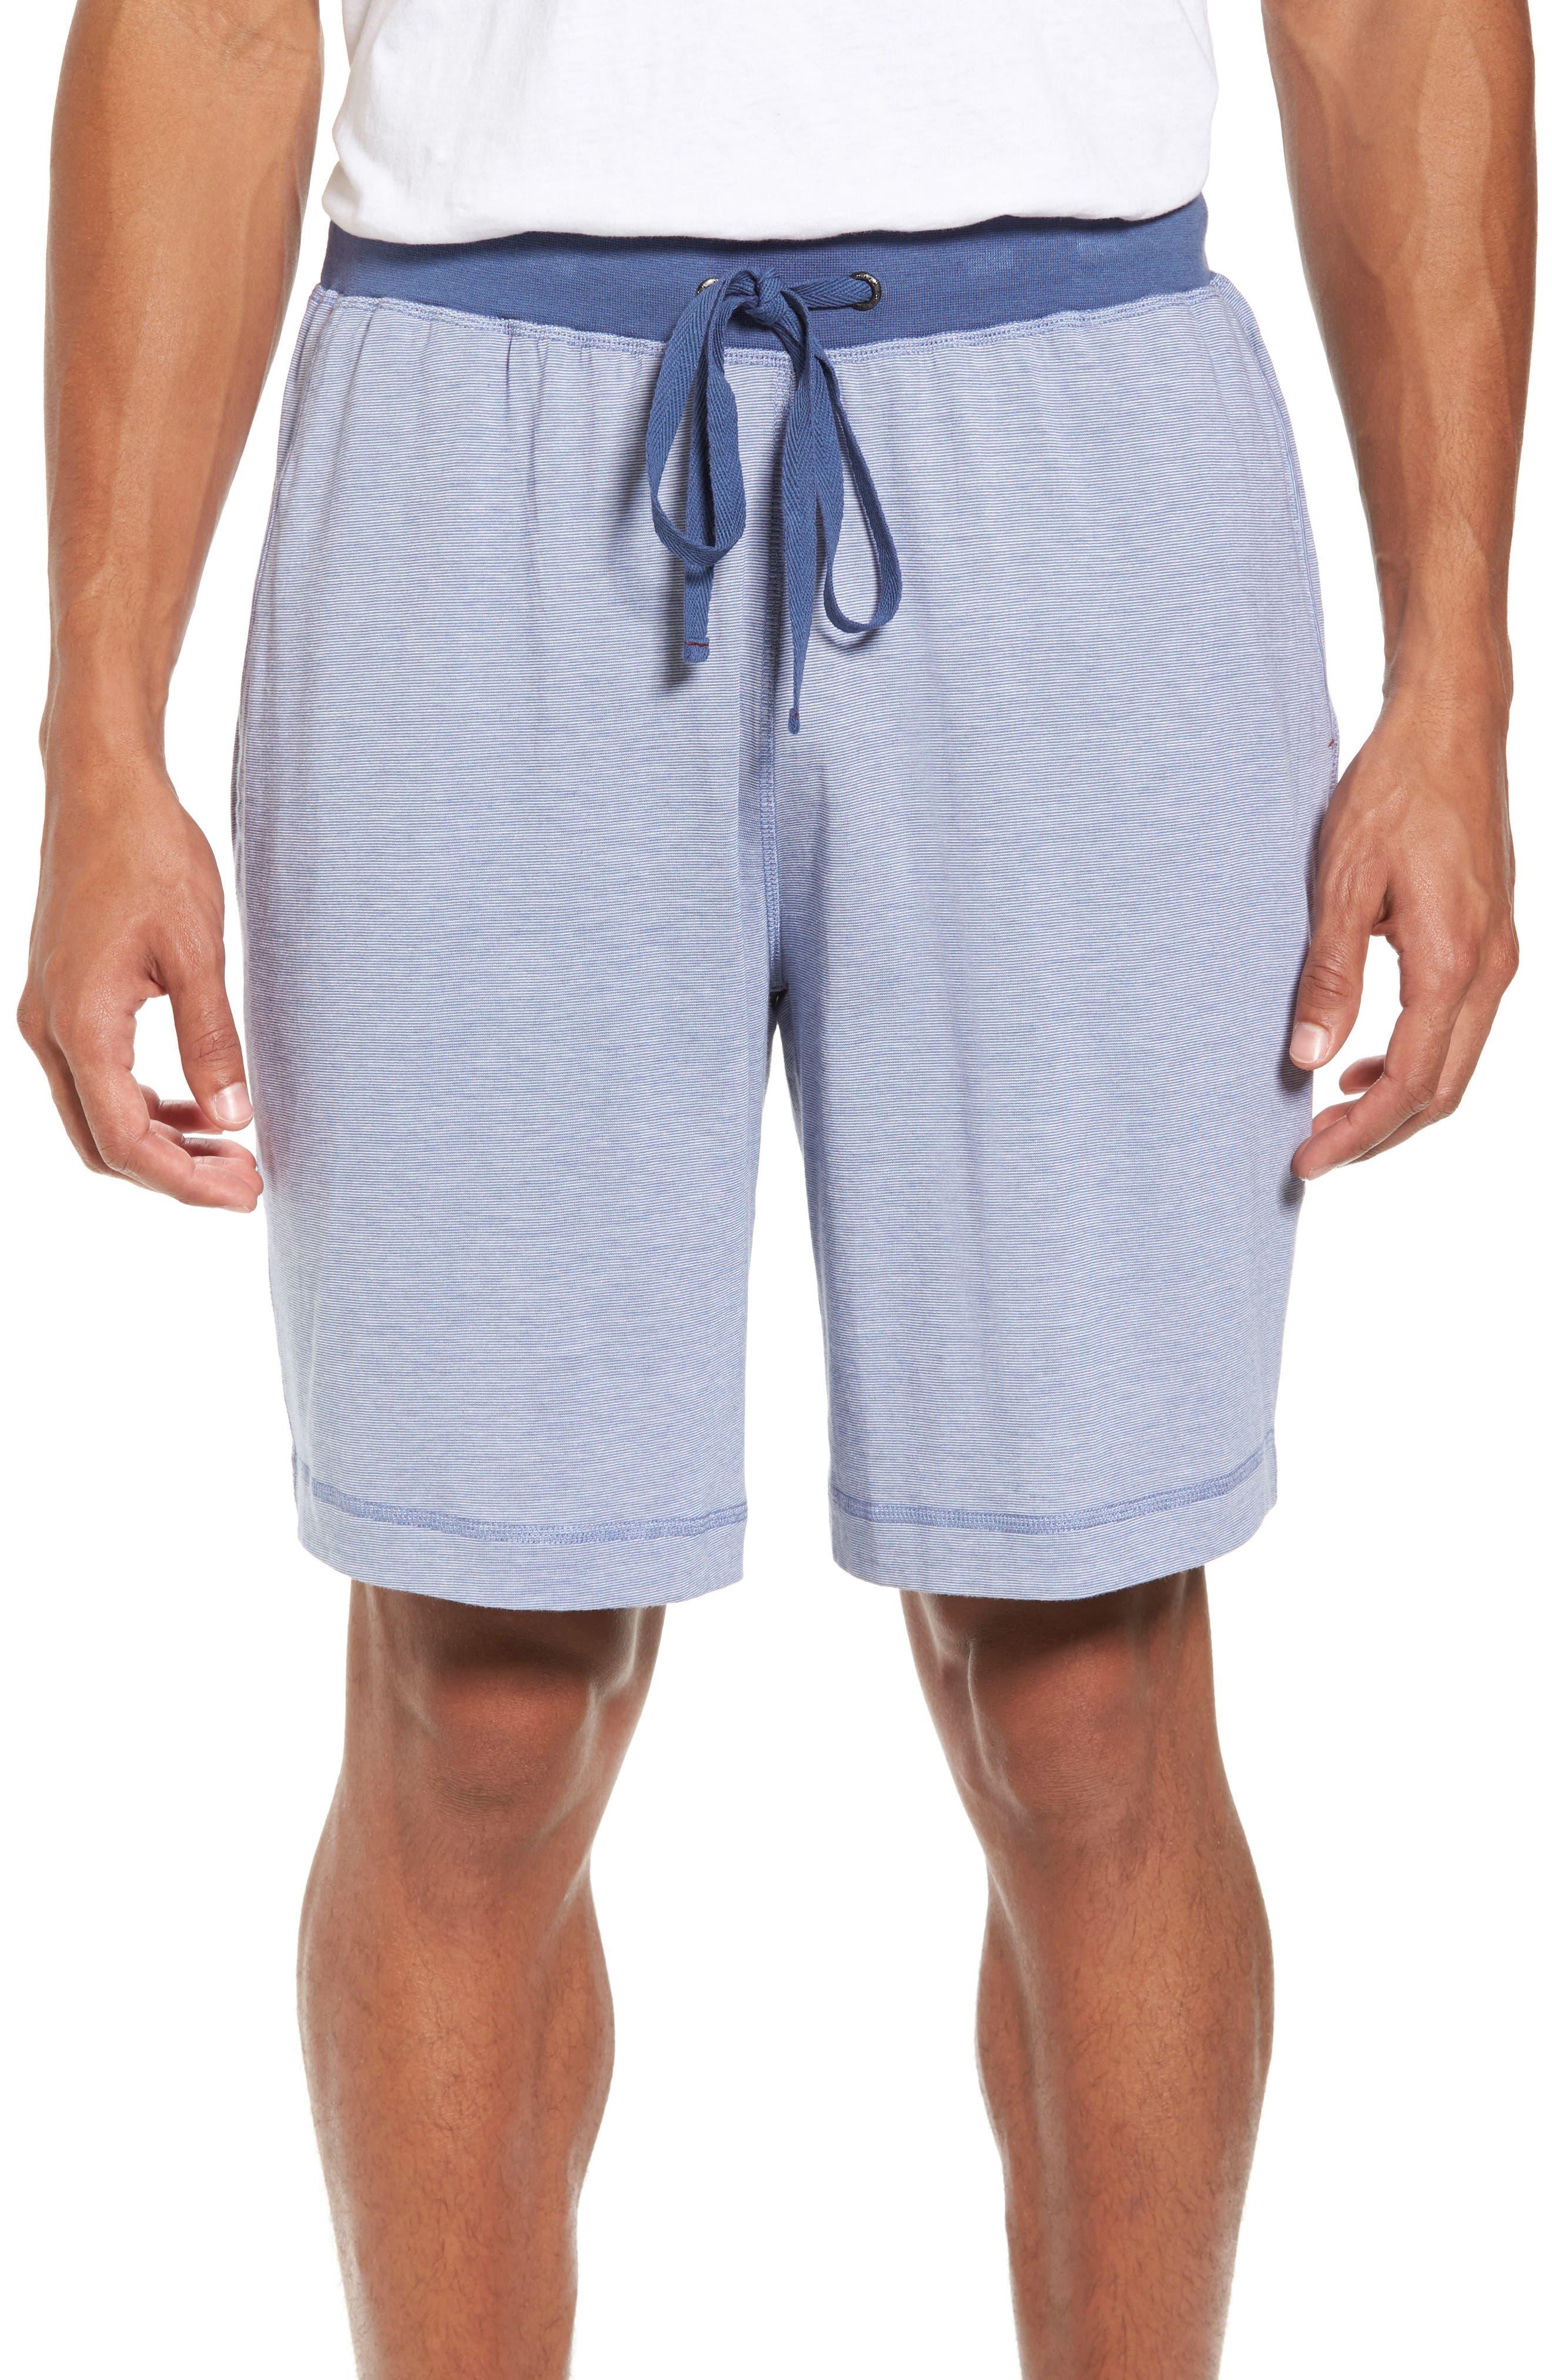 Pima Cotton & Modal Lounge Shorts,                             Main thumbnail 1, color,                             Blue/ Ivory